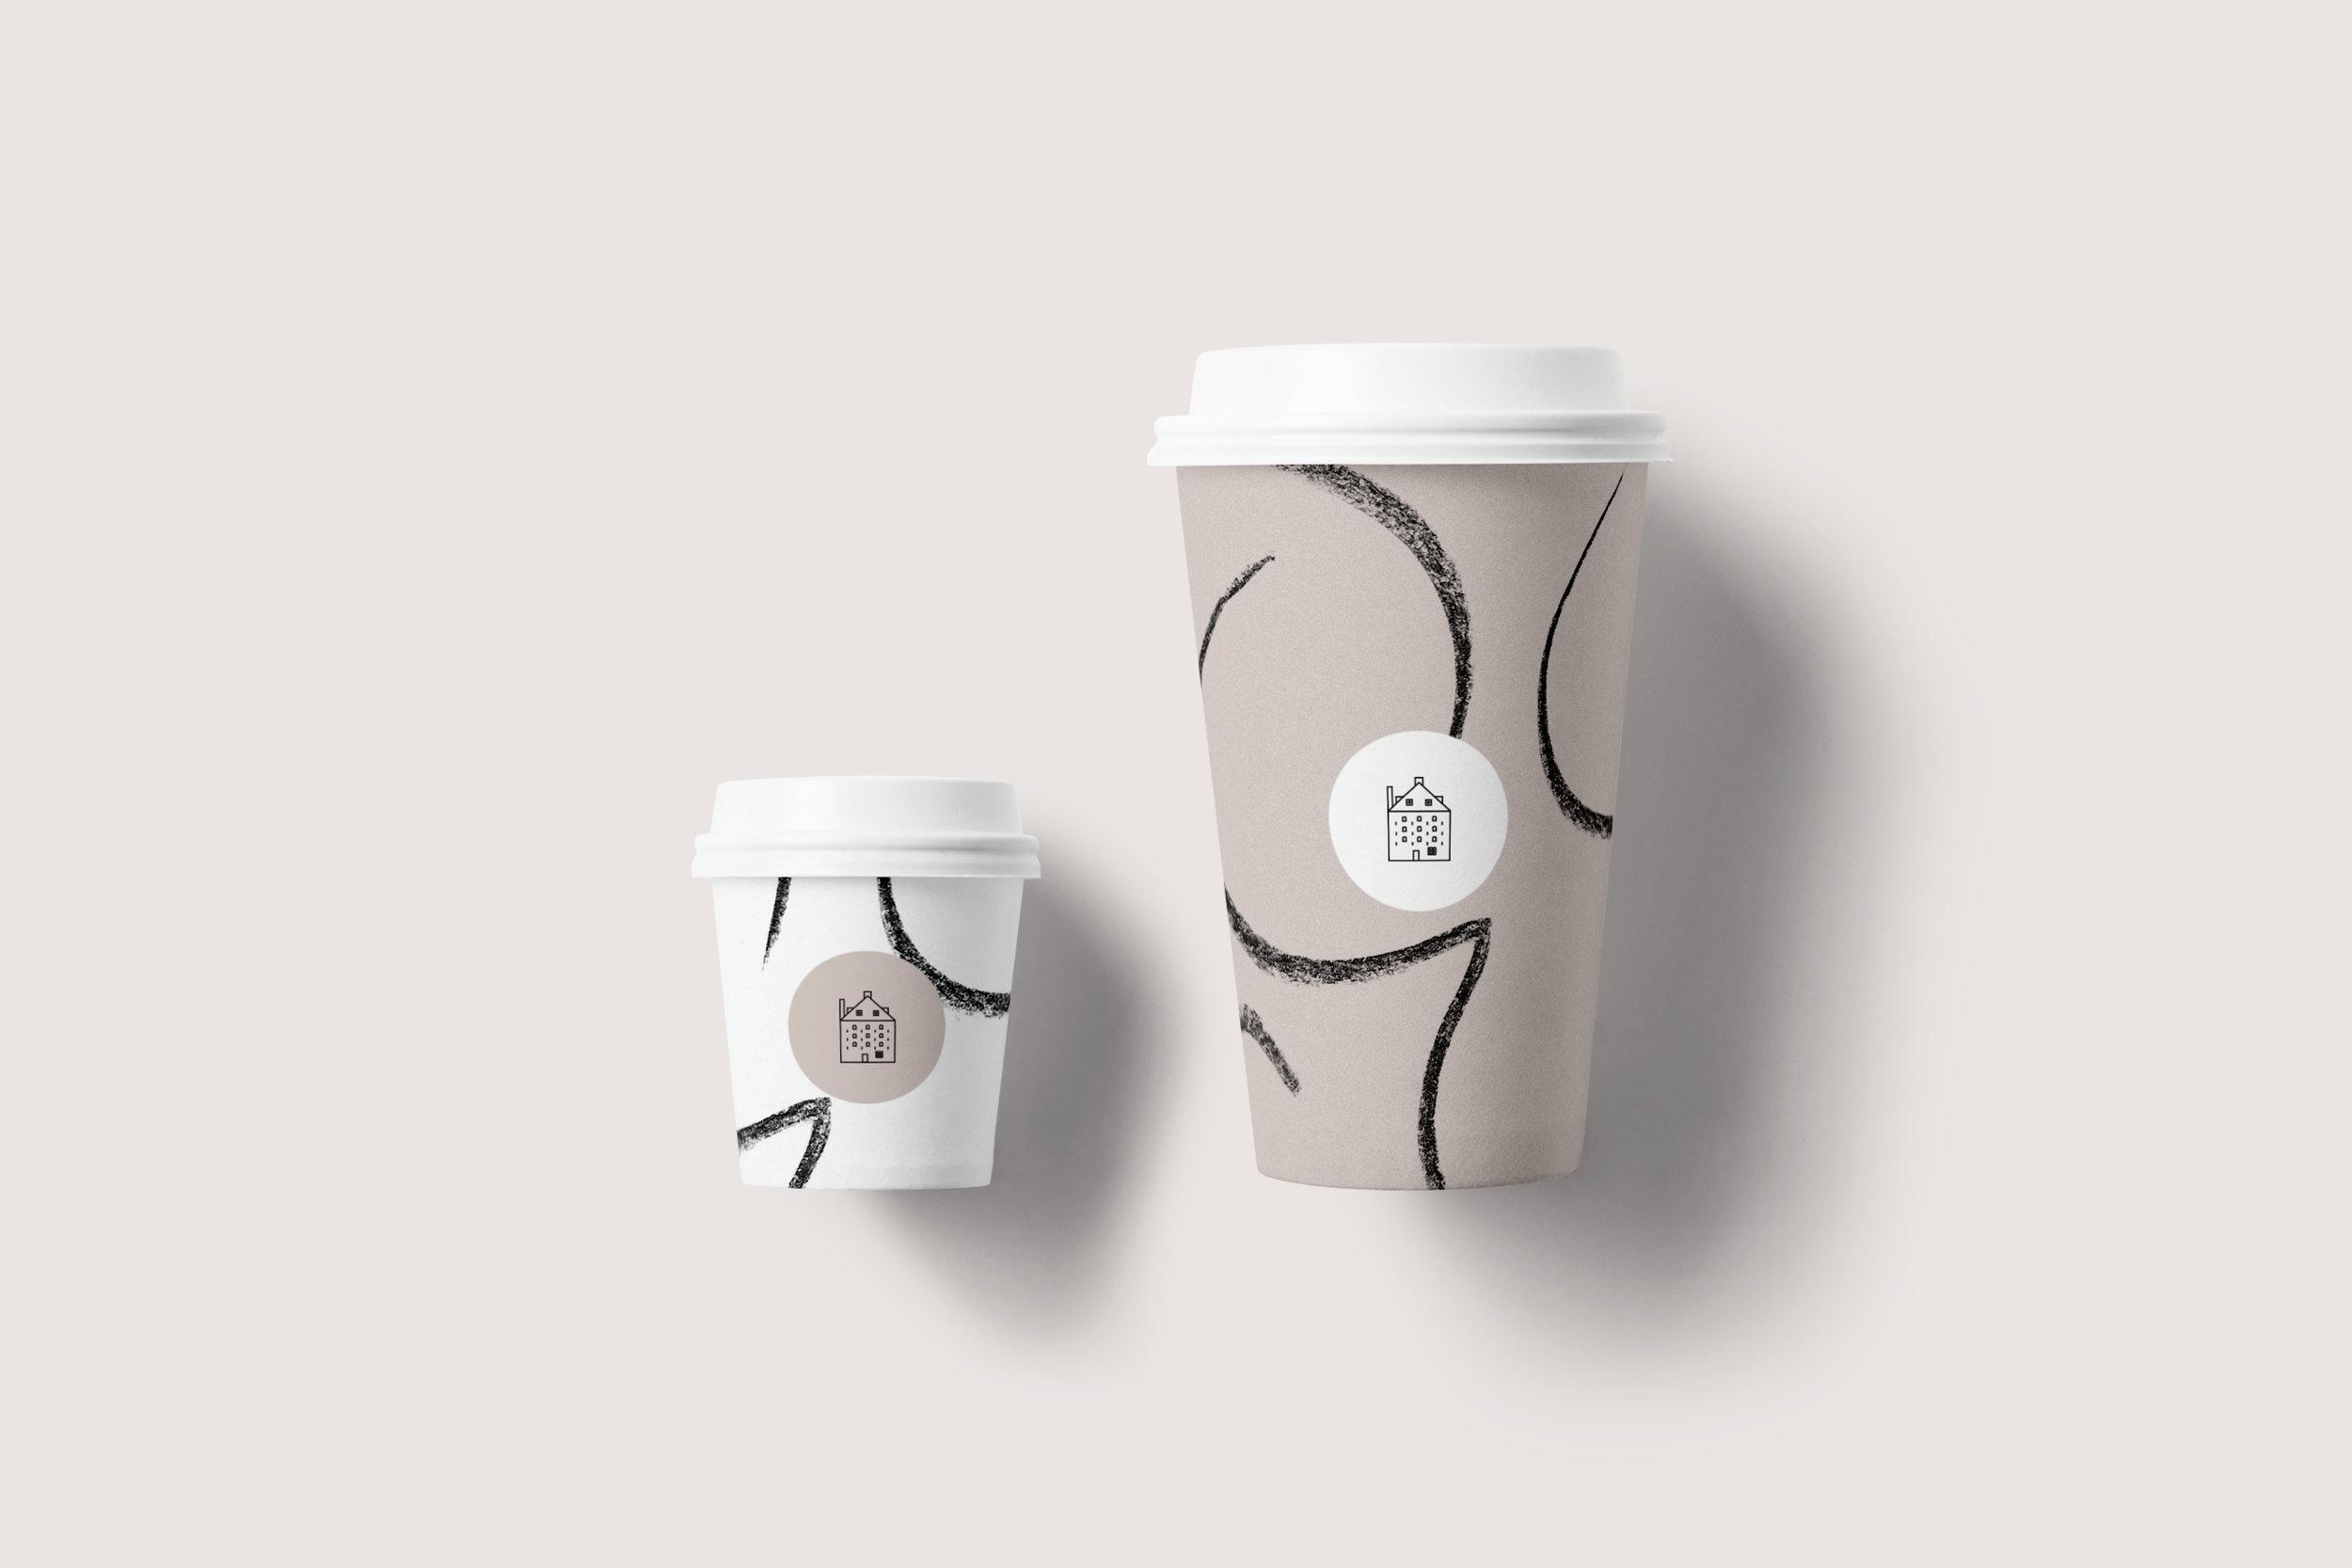 marta-vargas-kavalleriet-cafe-design4.jpg